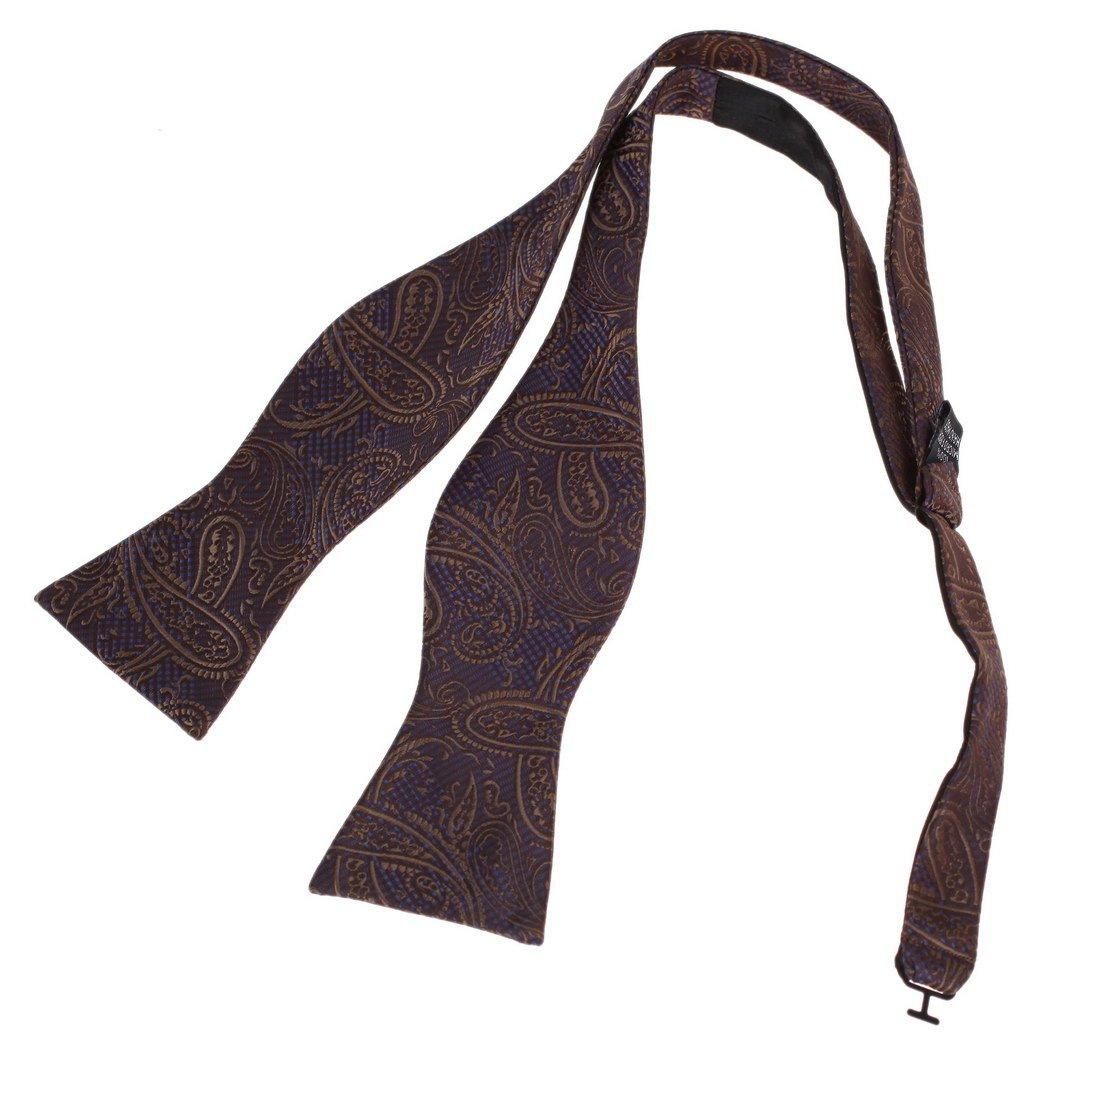 DBA7B17C Black World Gift Idea Patterned Self-tied Bowtie Holy Saturday Goods Microfiber Handmade Polyster Self Bow Tie By Dan Smith